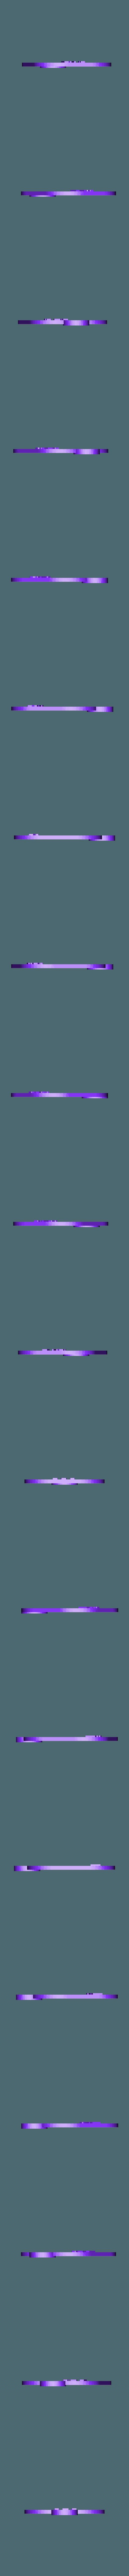 bts4.STL Download free STL file BTS KEYBOARD • 3D printable object, Lubal